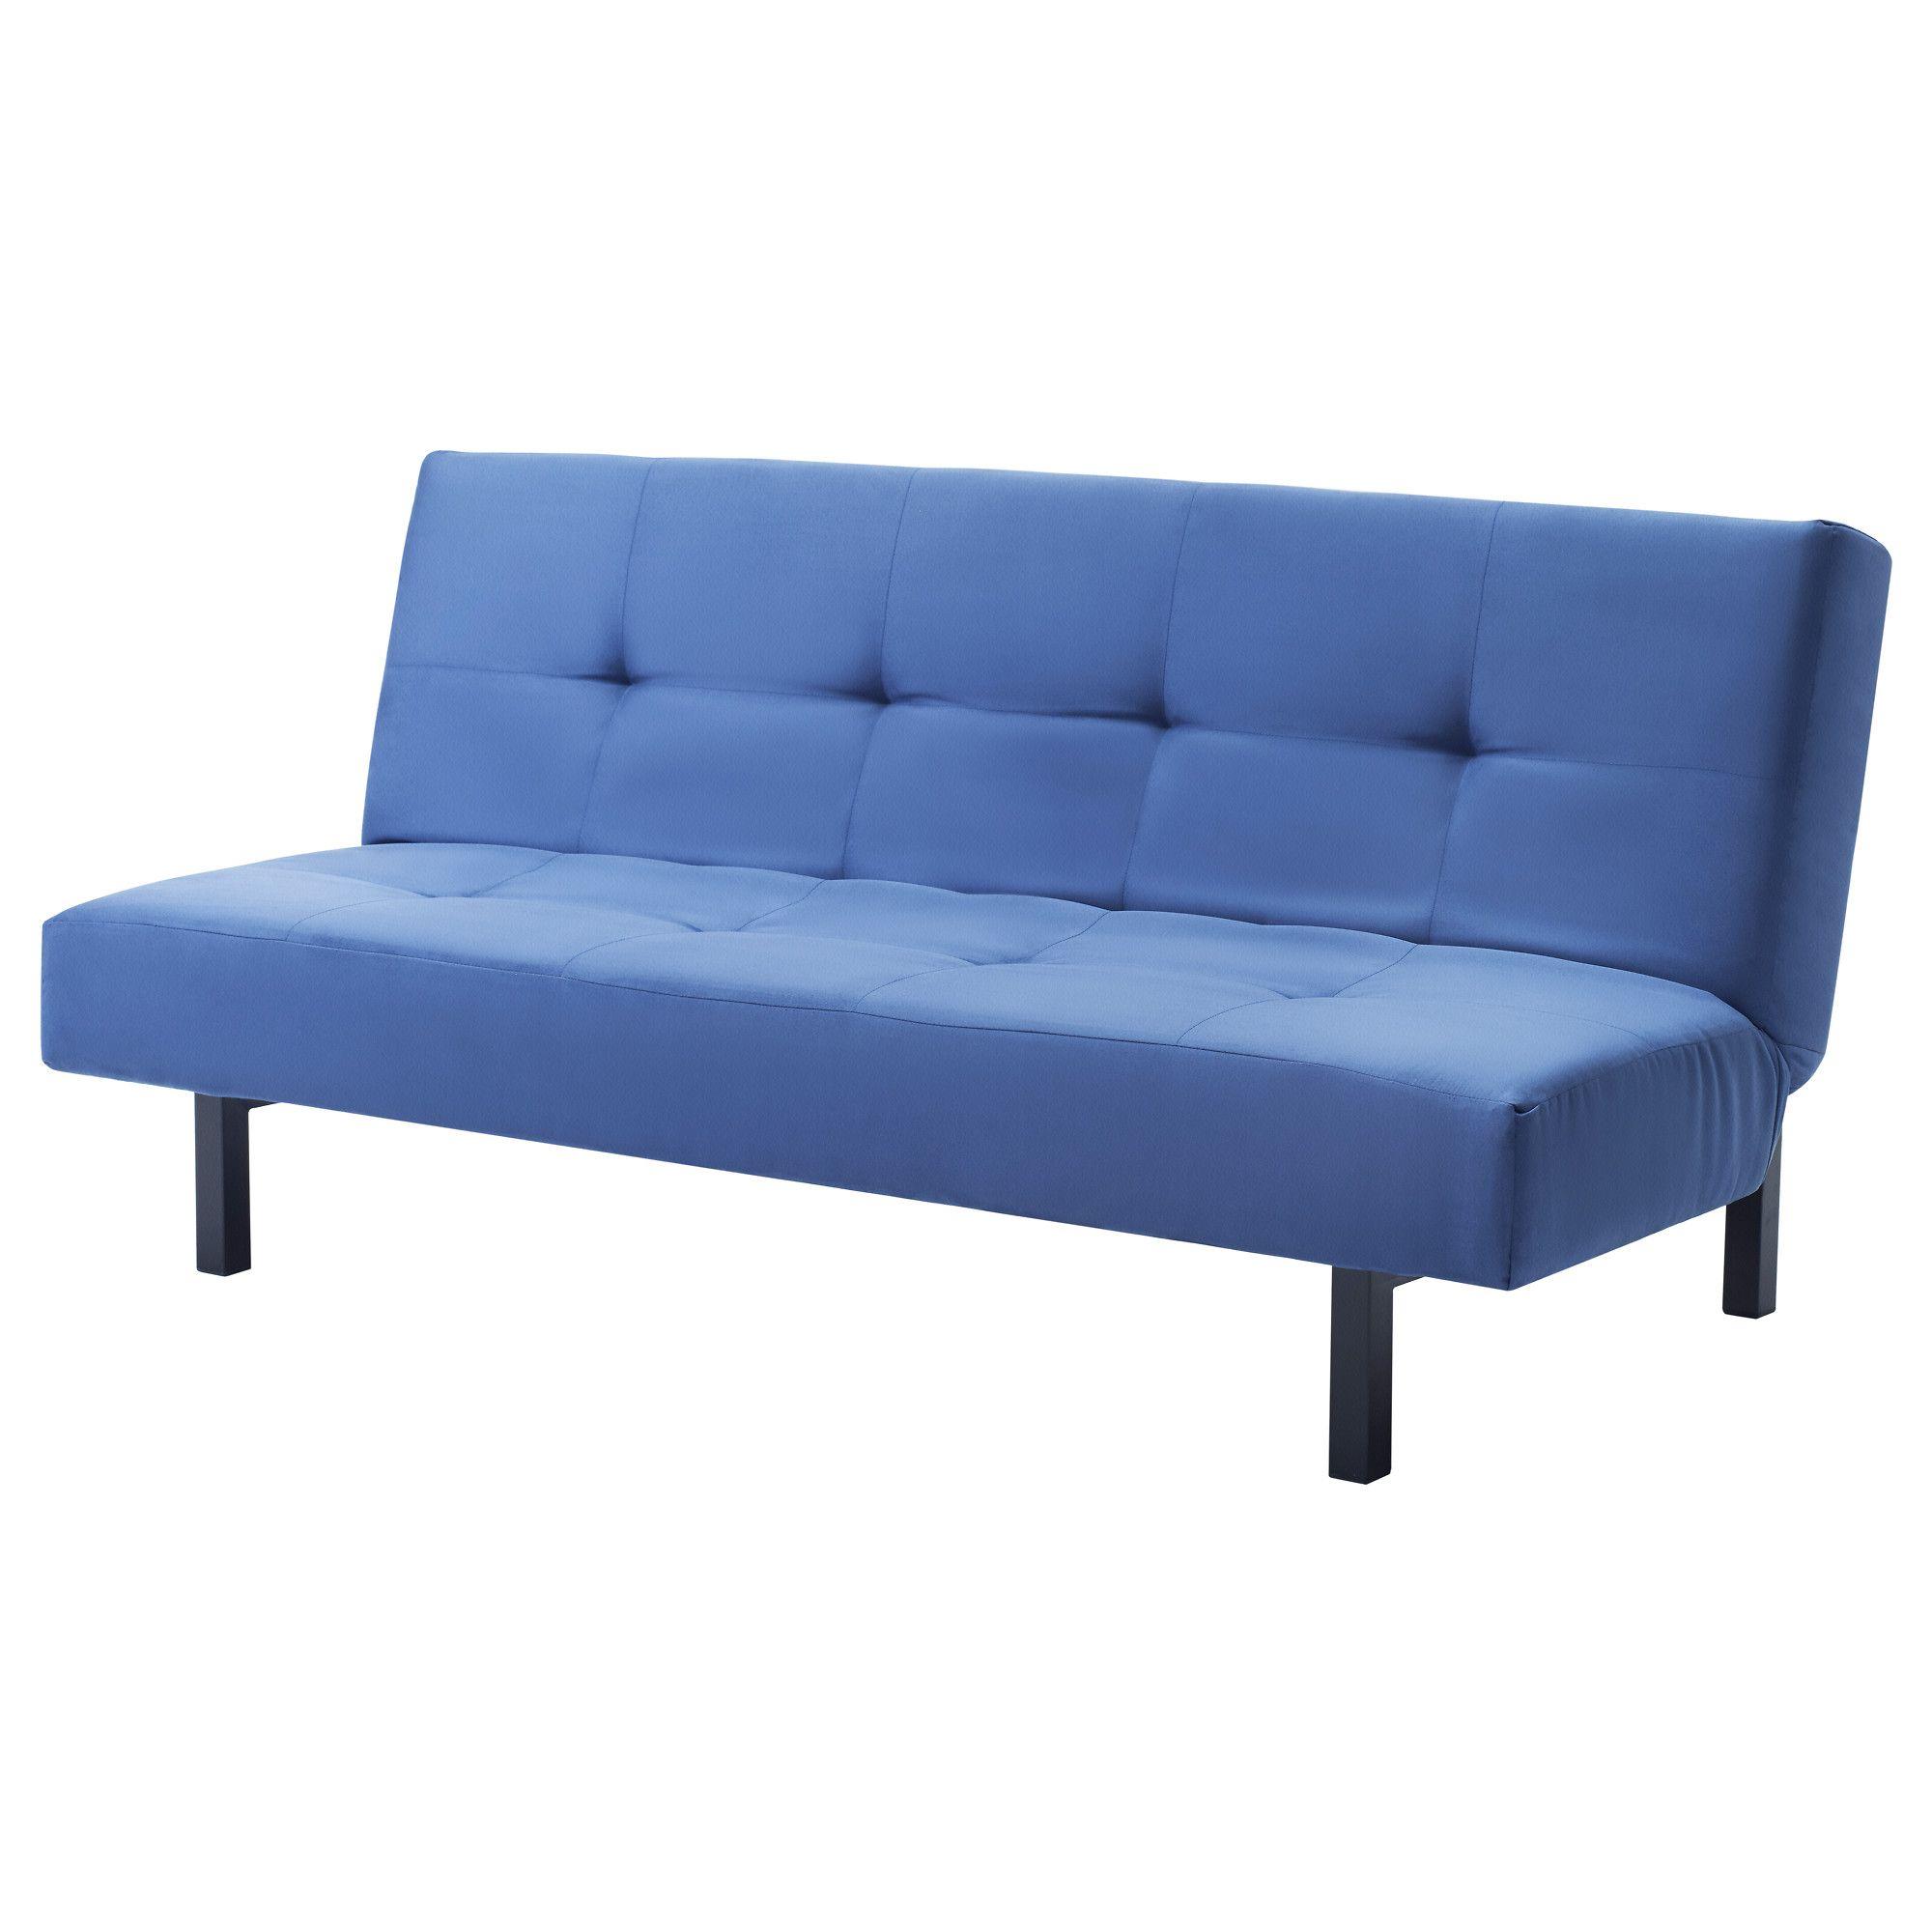 Ottoman That Turns Into A Chair Ikea Bett Bettsofa Und Sofa